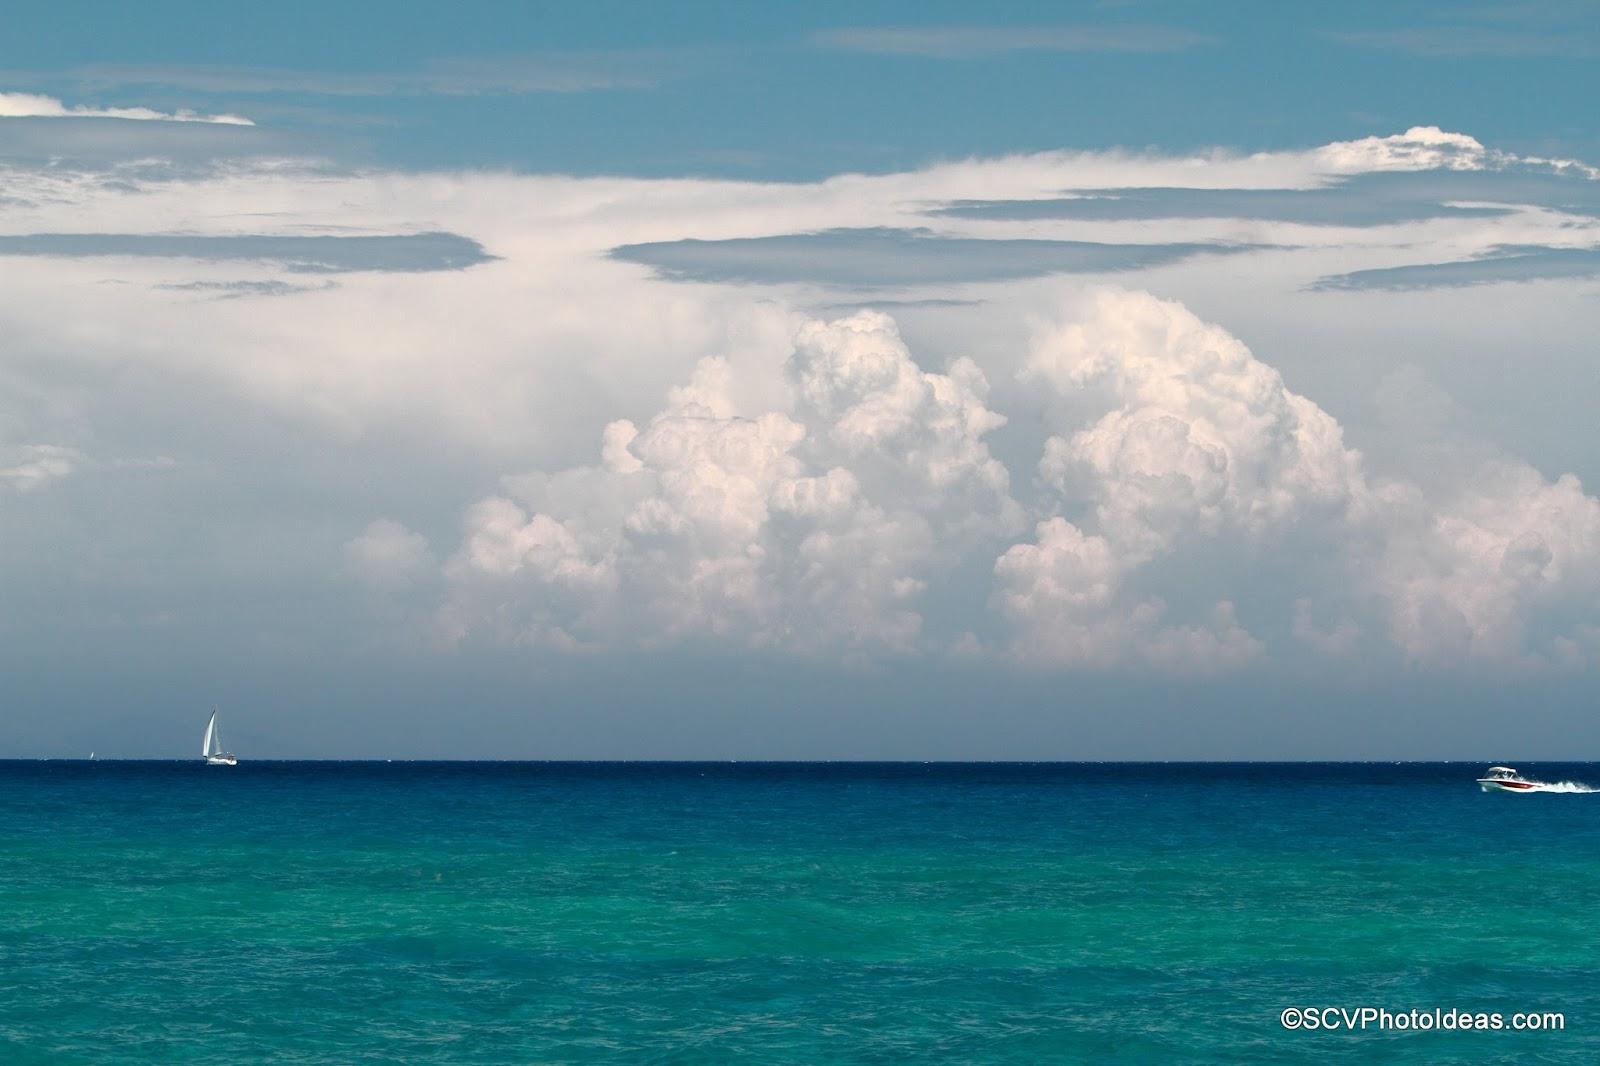 Green Blue Sea Waters at Skala Kefalonia II